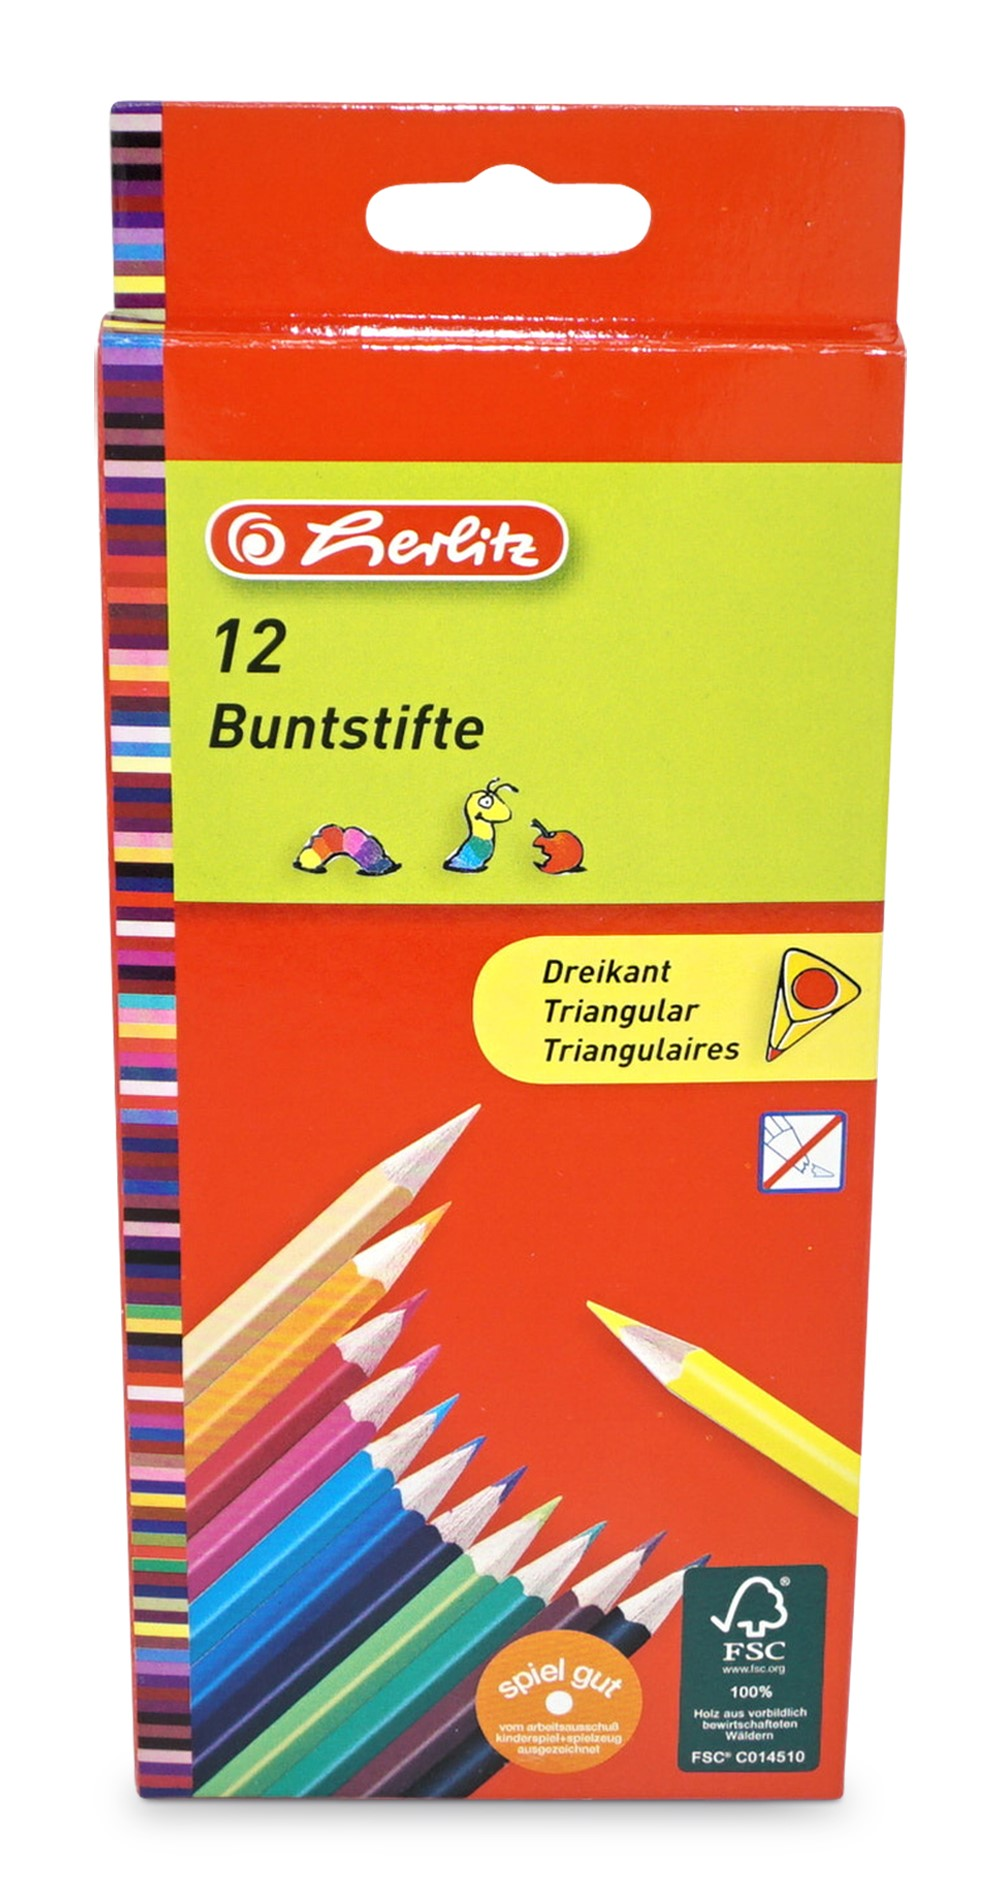 Herlitz  Buntstifte dreikant, 12er-Packung